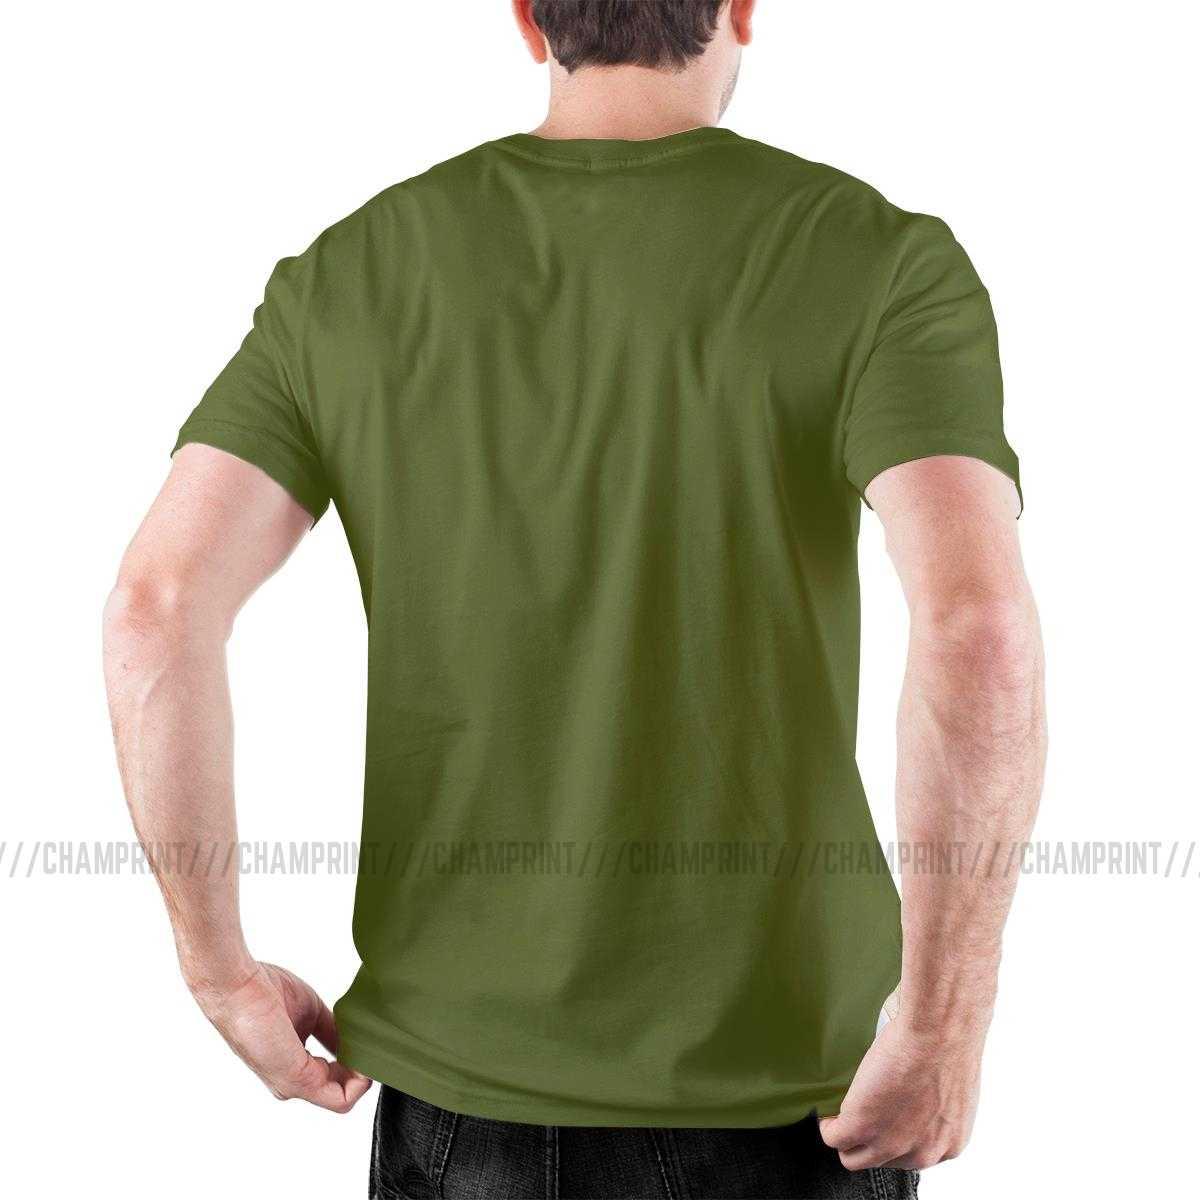 Geist Strand Gänsehaut T-Shirts für Männer Haunted Halloween Monster Buch Film Comic Super Baumwolle Tees Kurzarm T Hemd